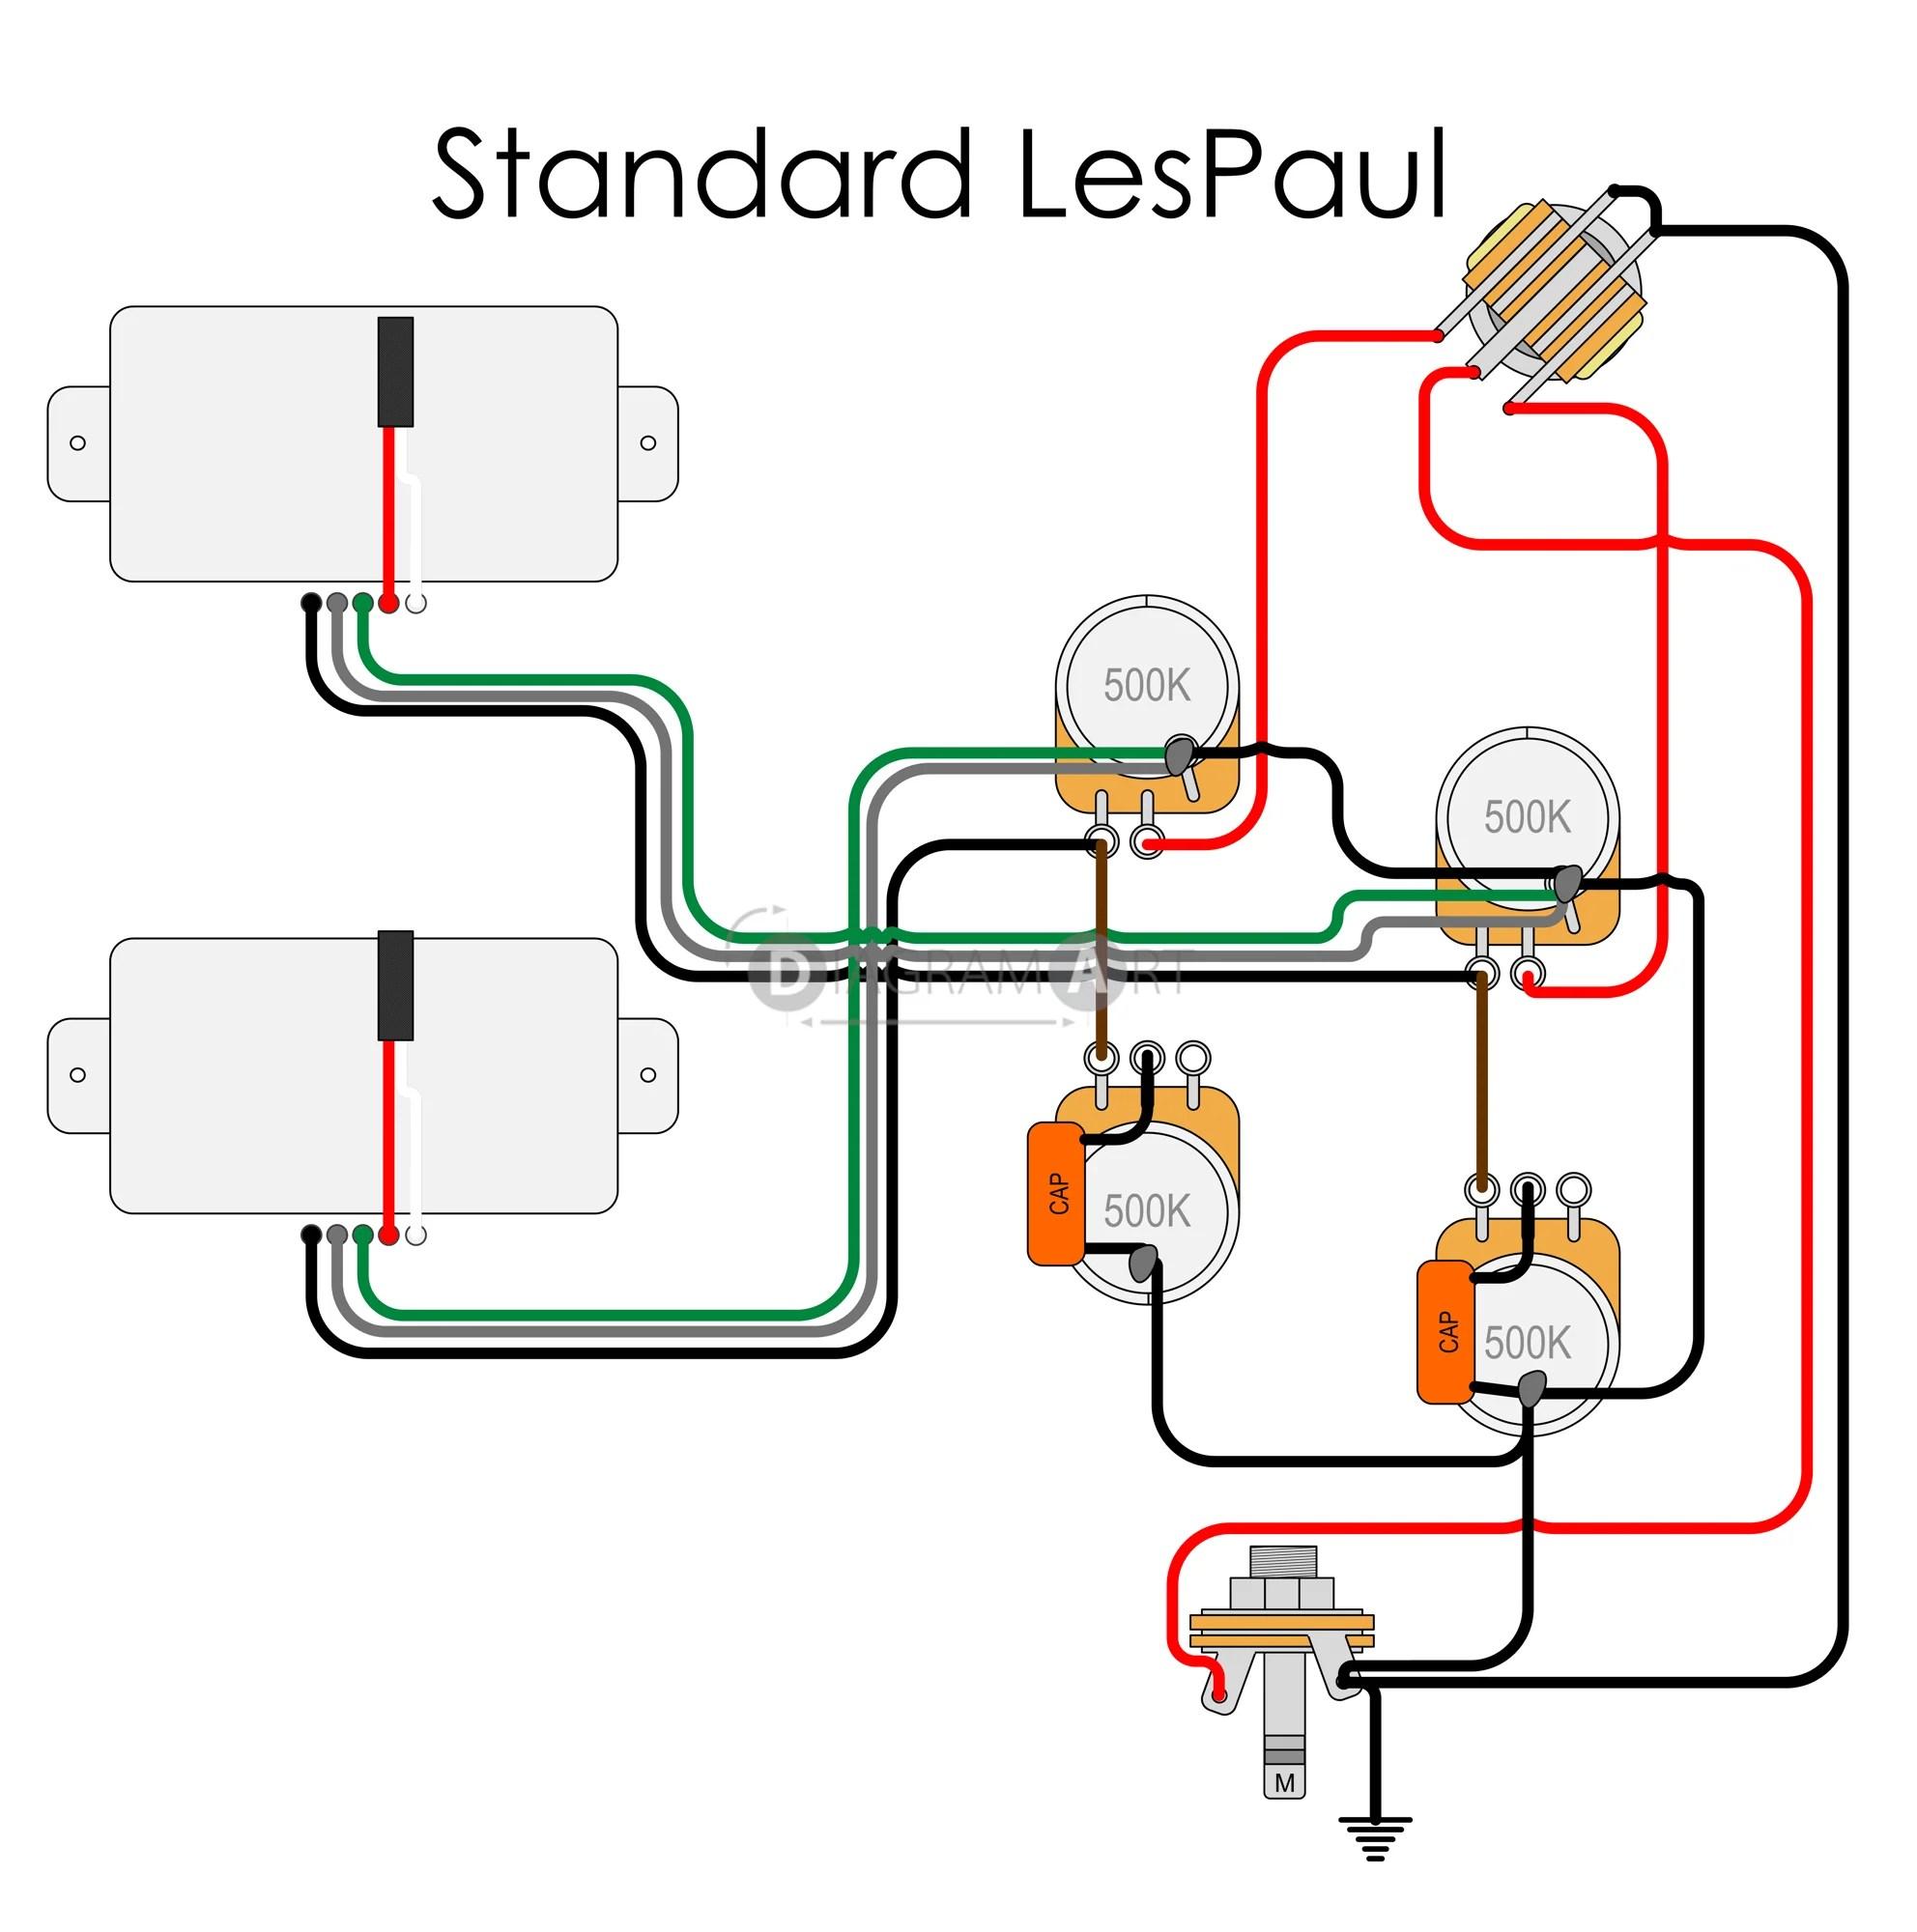 electric guitar wiring standard lespaul electric circuit diagramart vintage les paul wiring diagram electric [ 1984 x 2000 Pixel ]